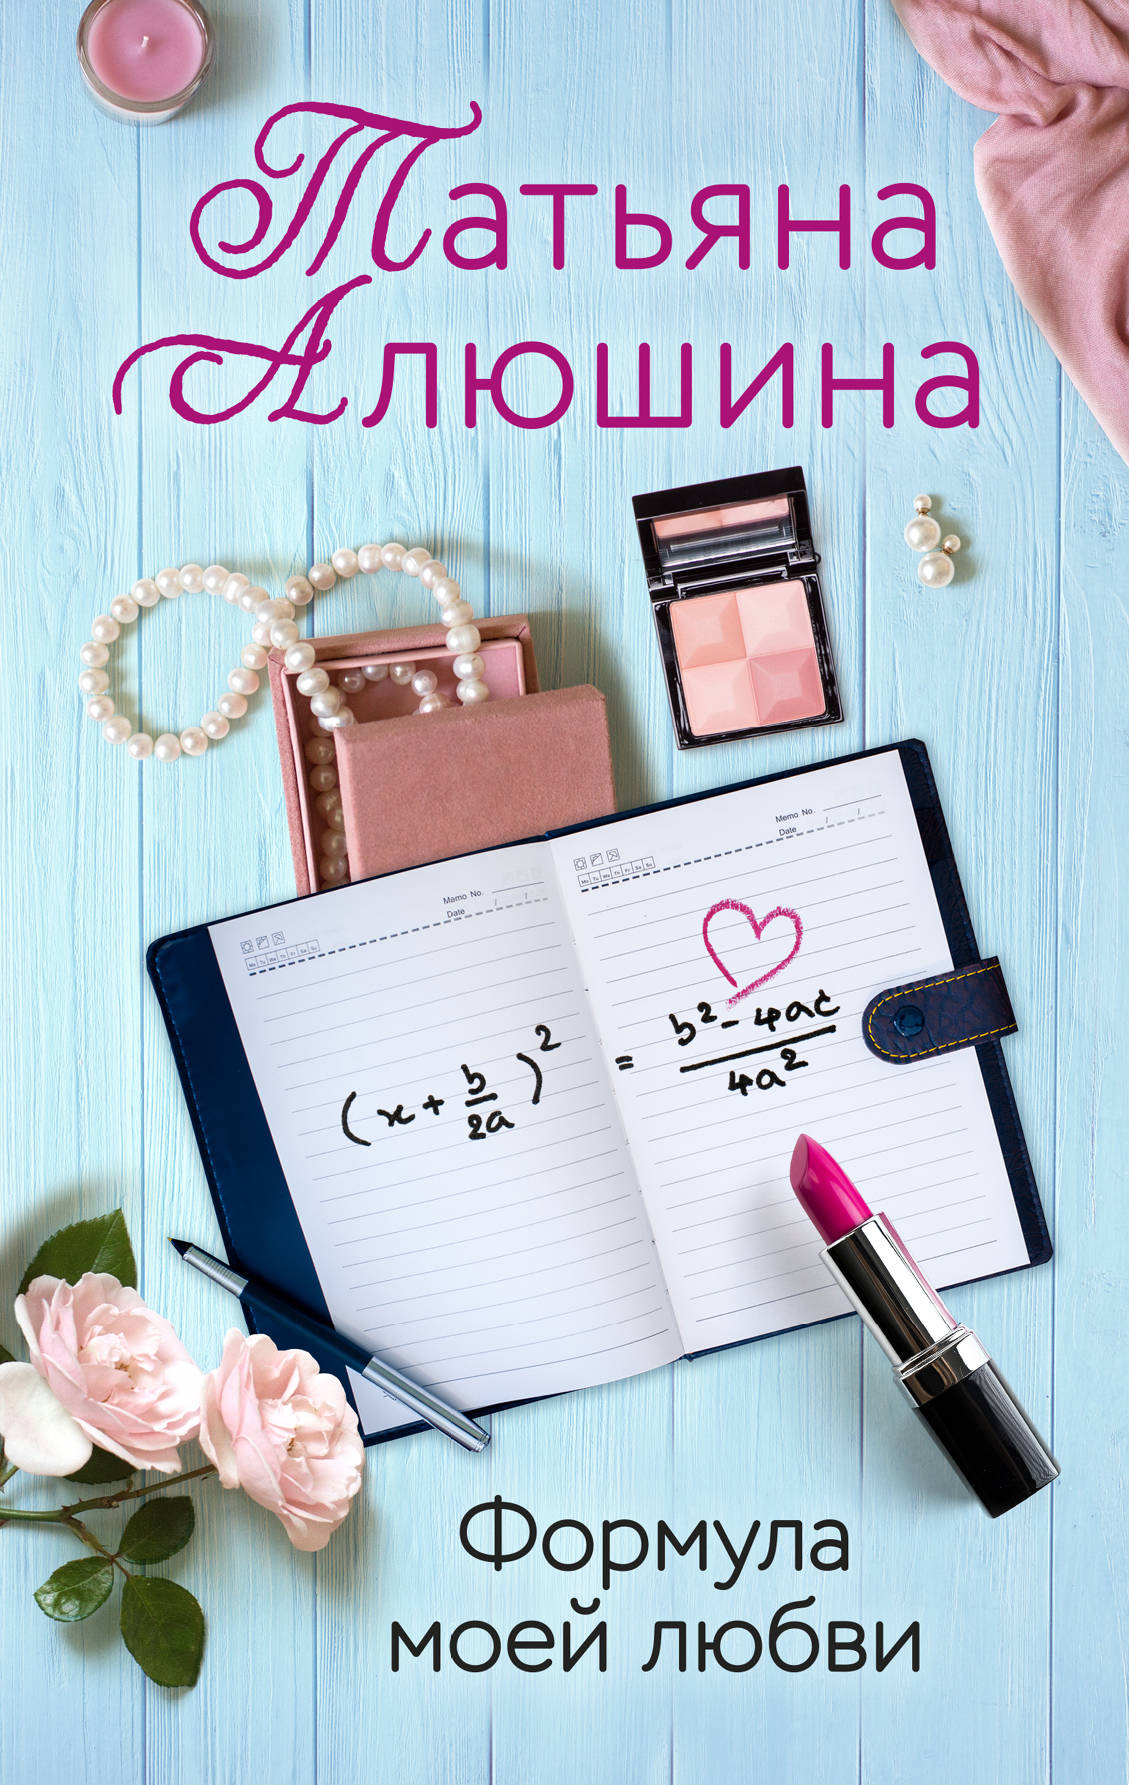 Formula moej ljubvi